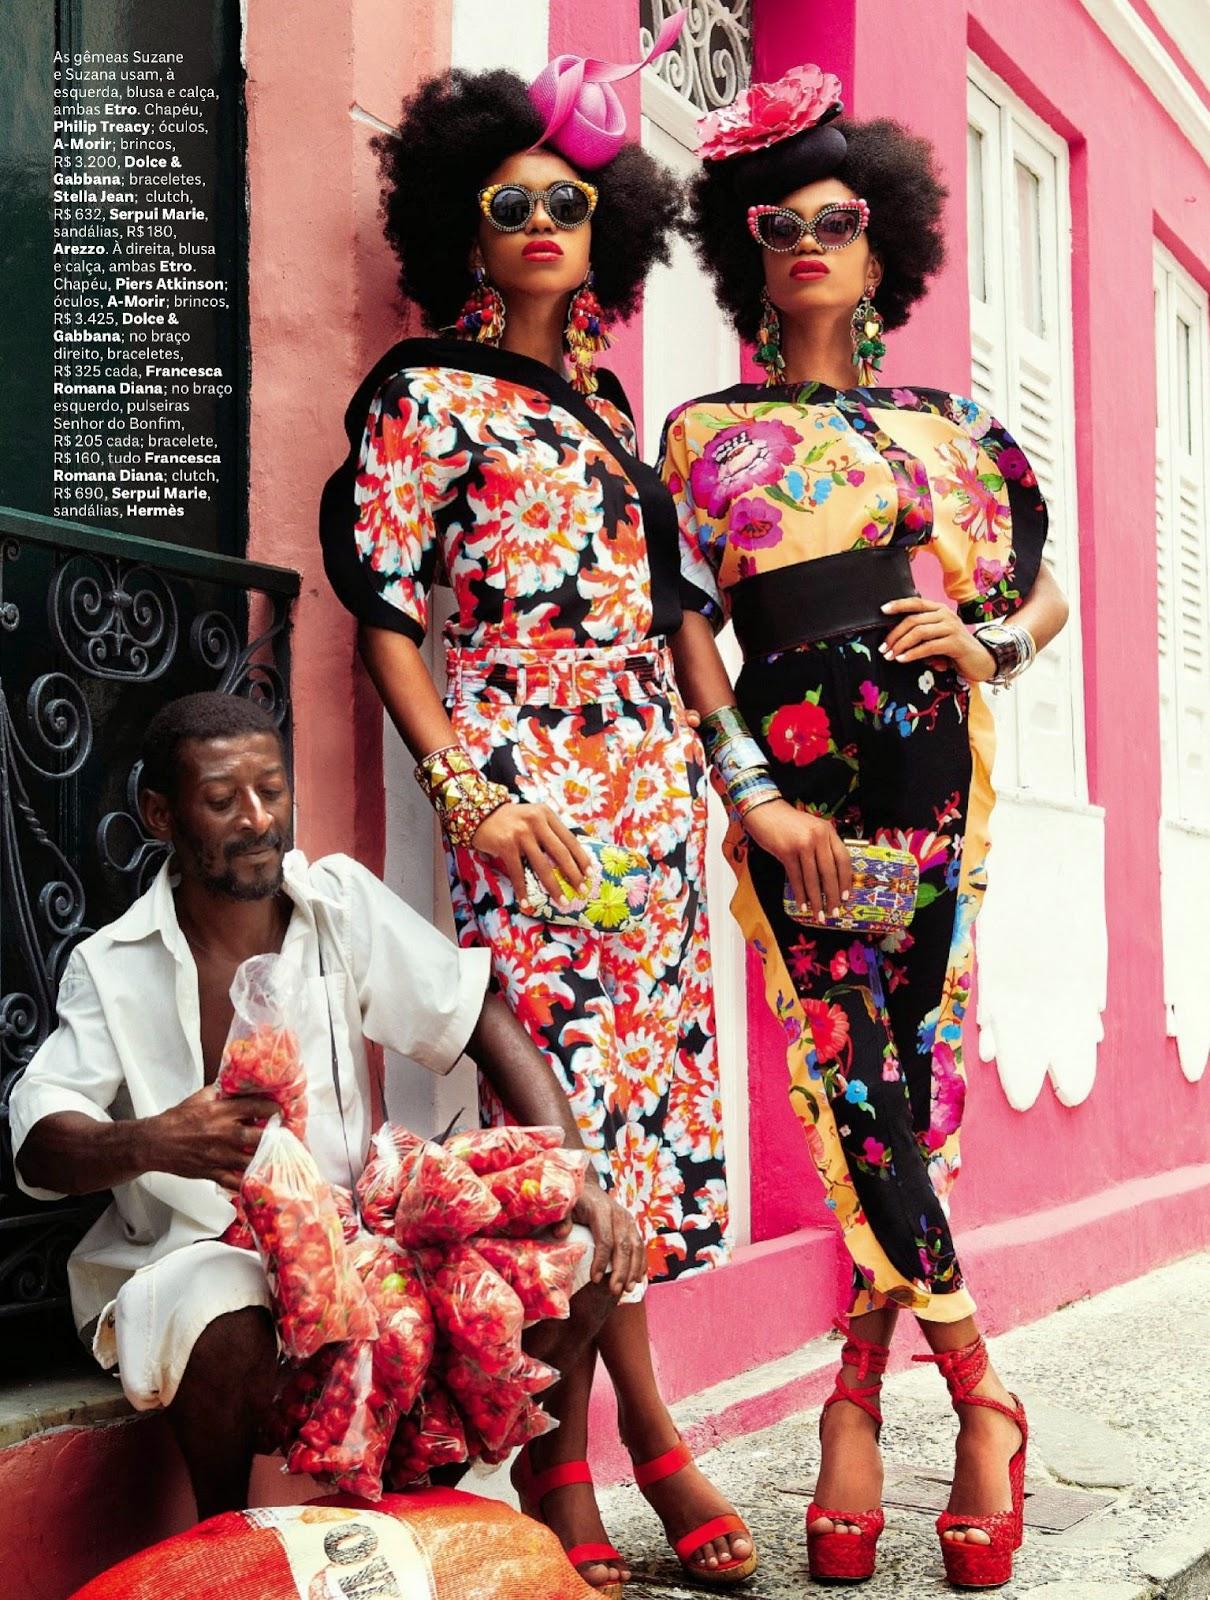 Suzane & Suzana Massena by Giampaolo Sgura for Vogue Brazil February 2013 | Ses Rêveries